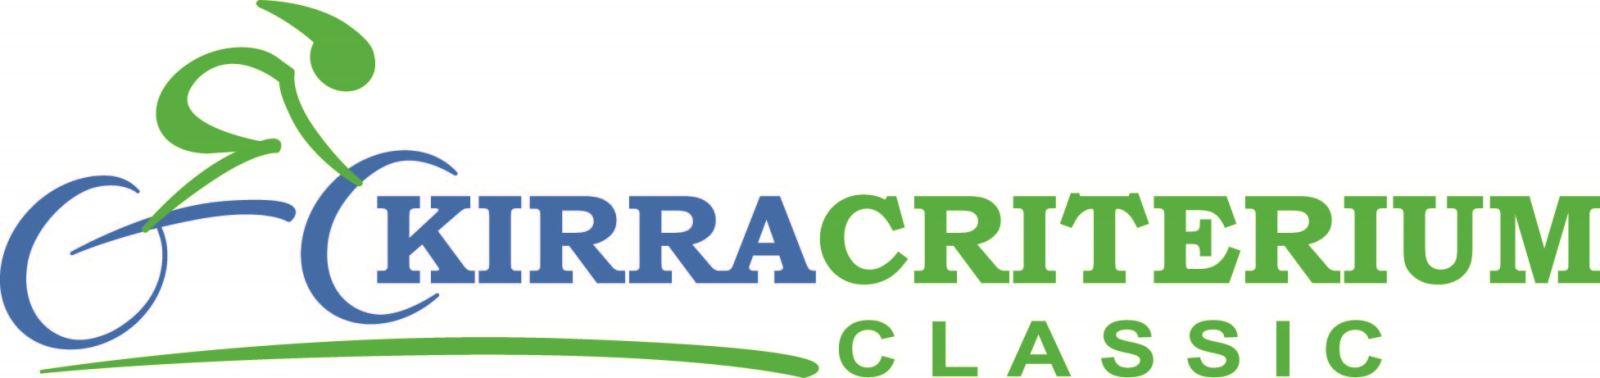 kirra-criterium-classic-logo_cmyk